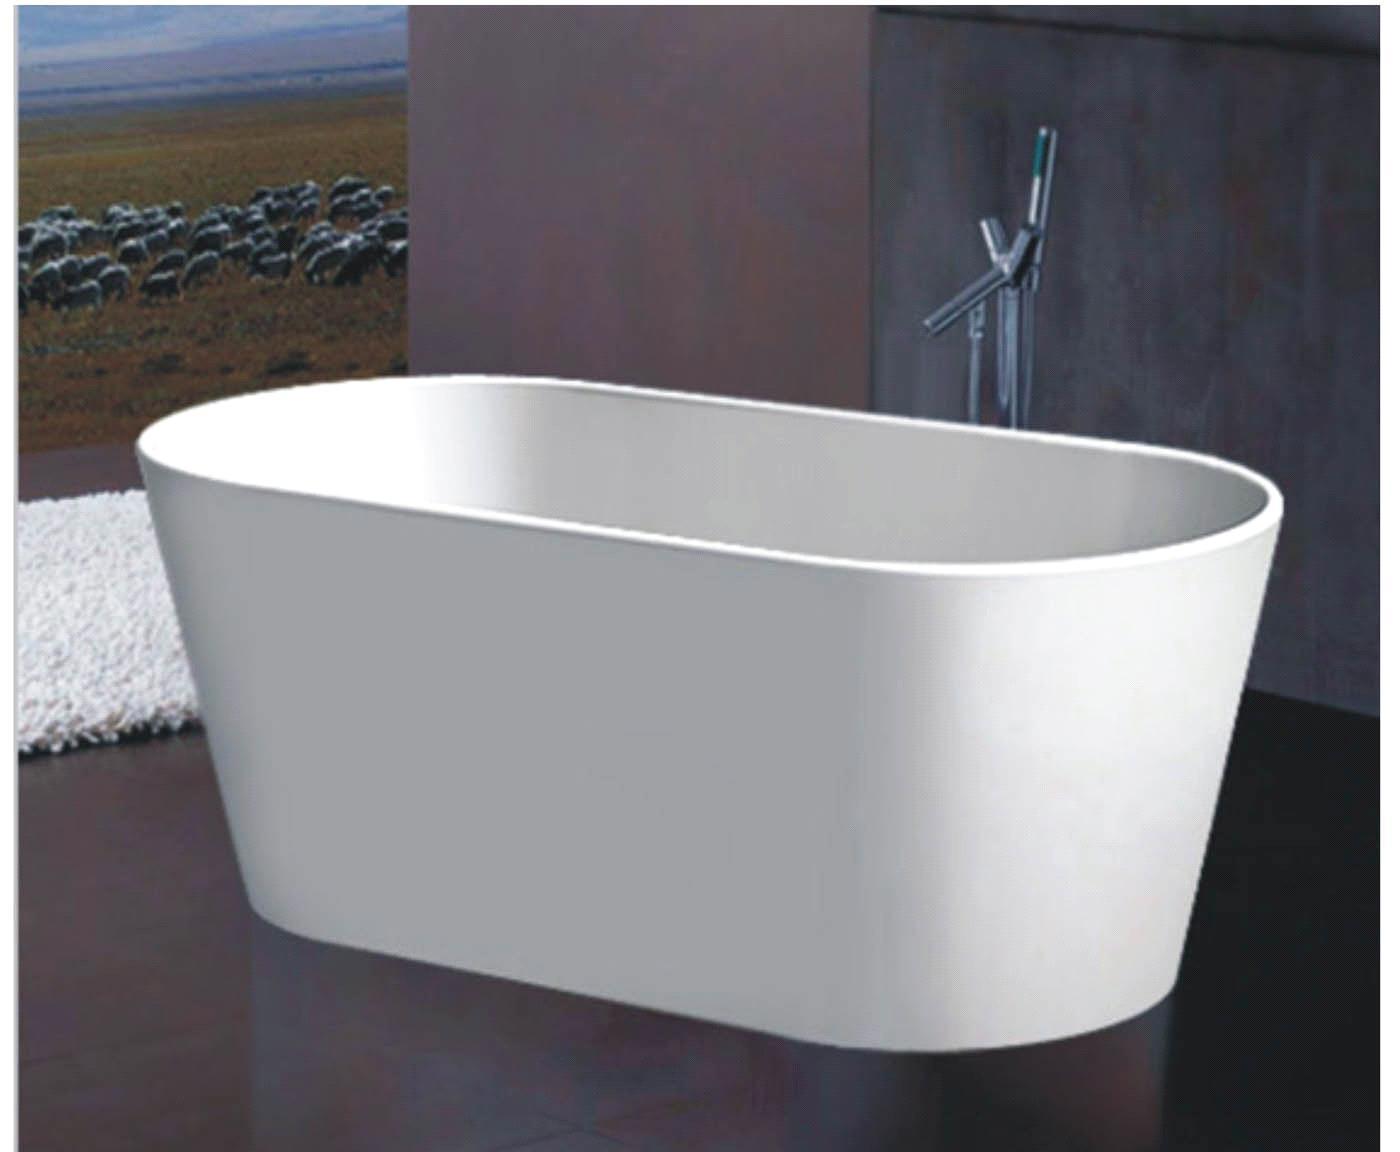 Stone Bathtub purchasing, souring agent | ECVV.com purchasing ...